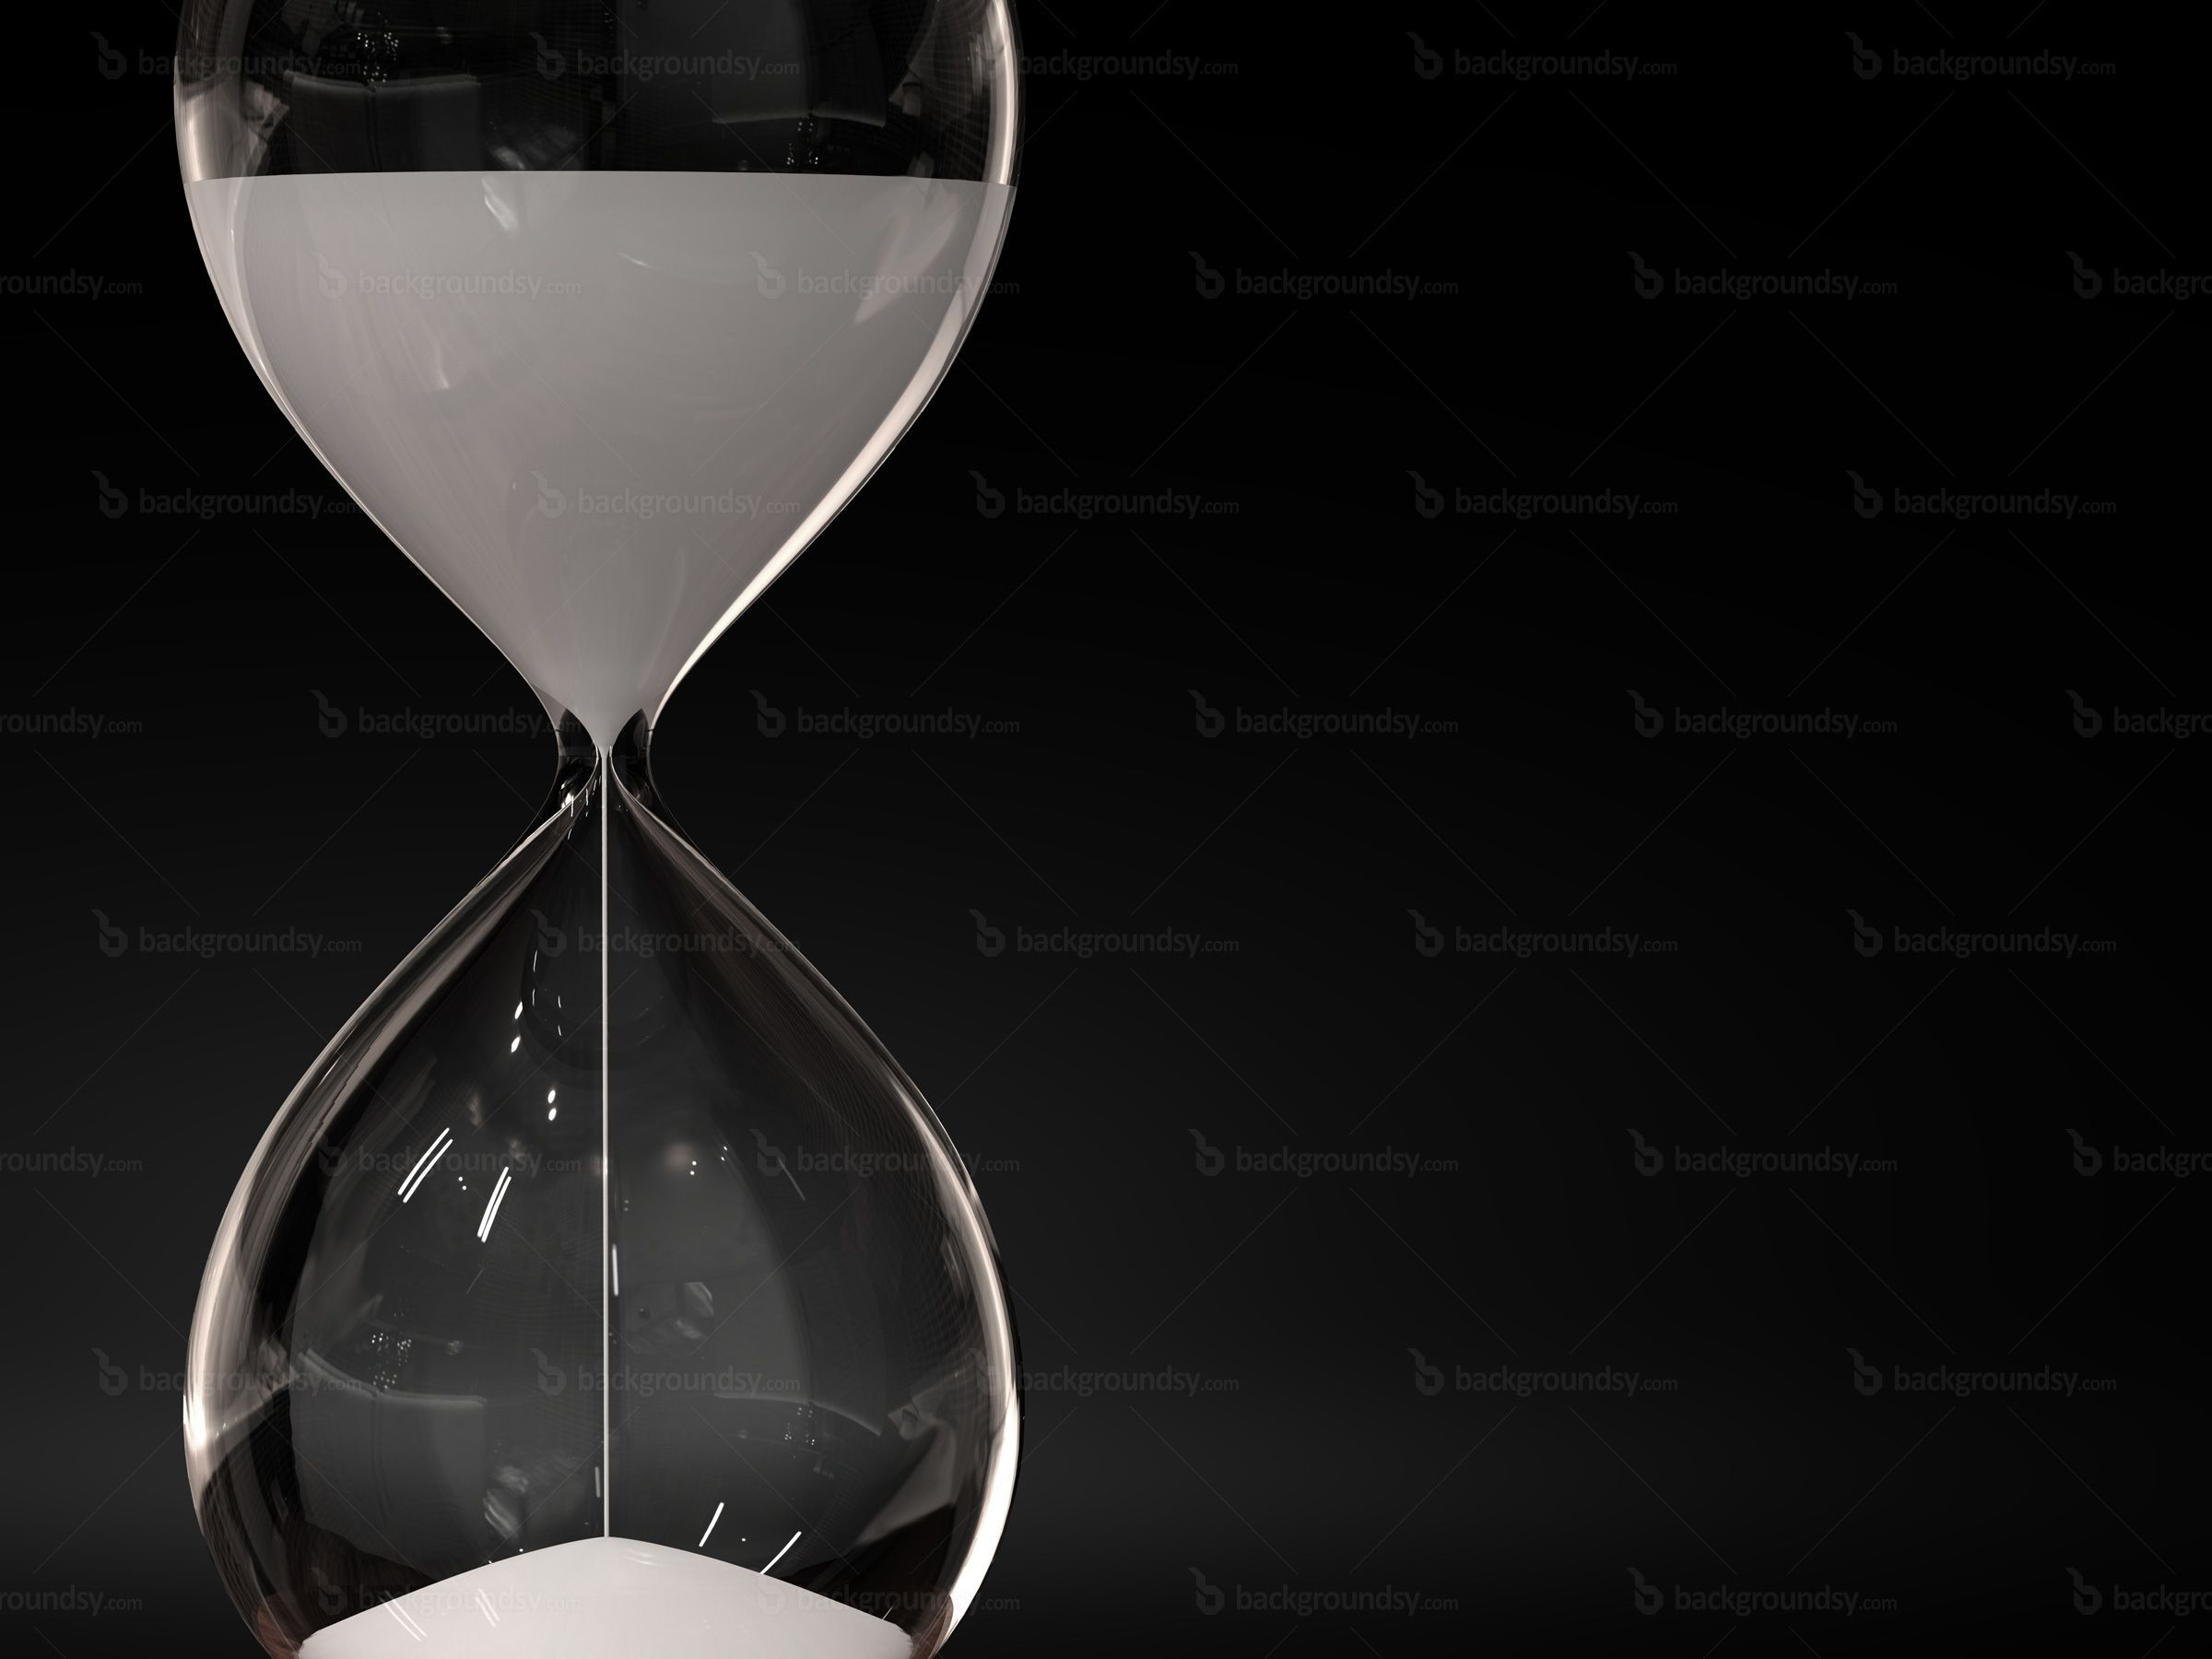 running clock wallpaper for desktop,hourglass,glass,still life photography,stemware,wine glass